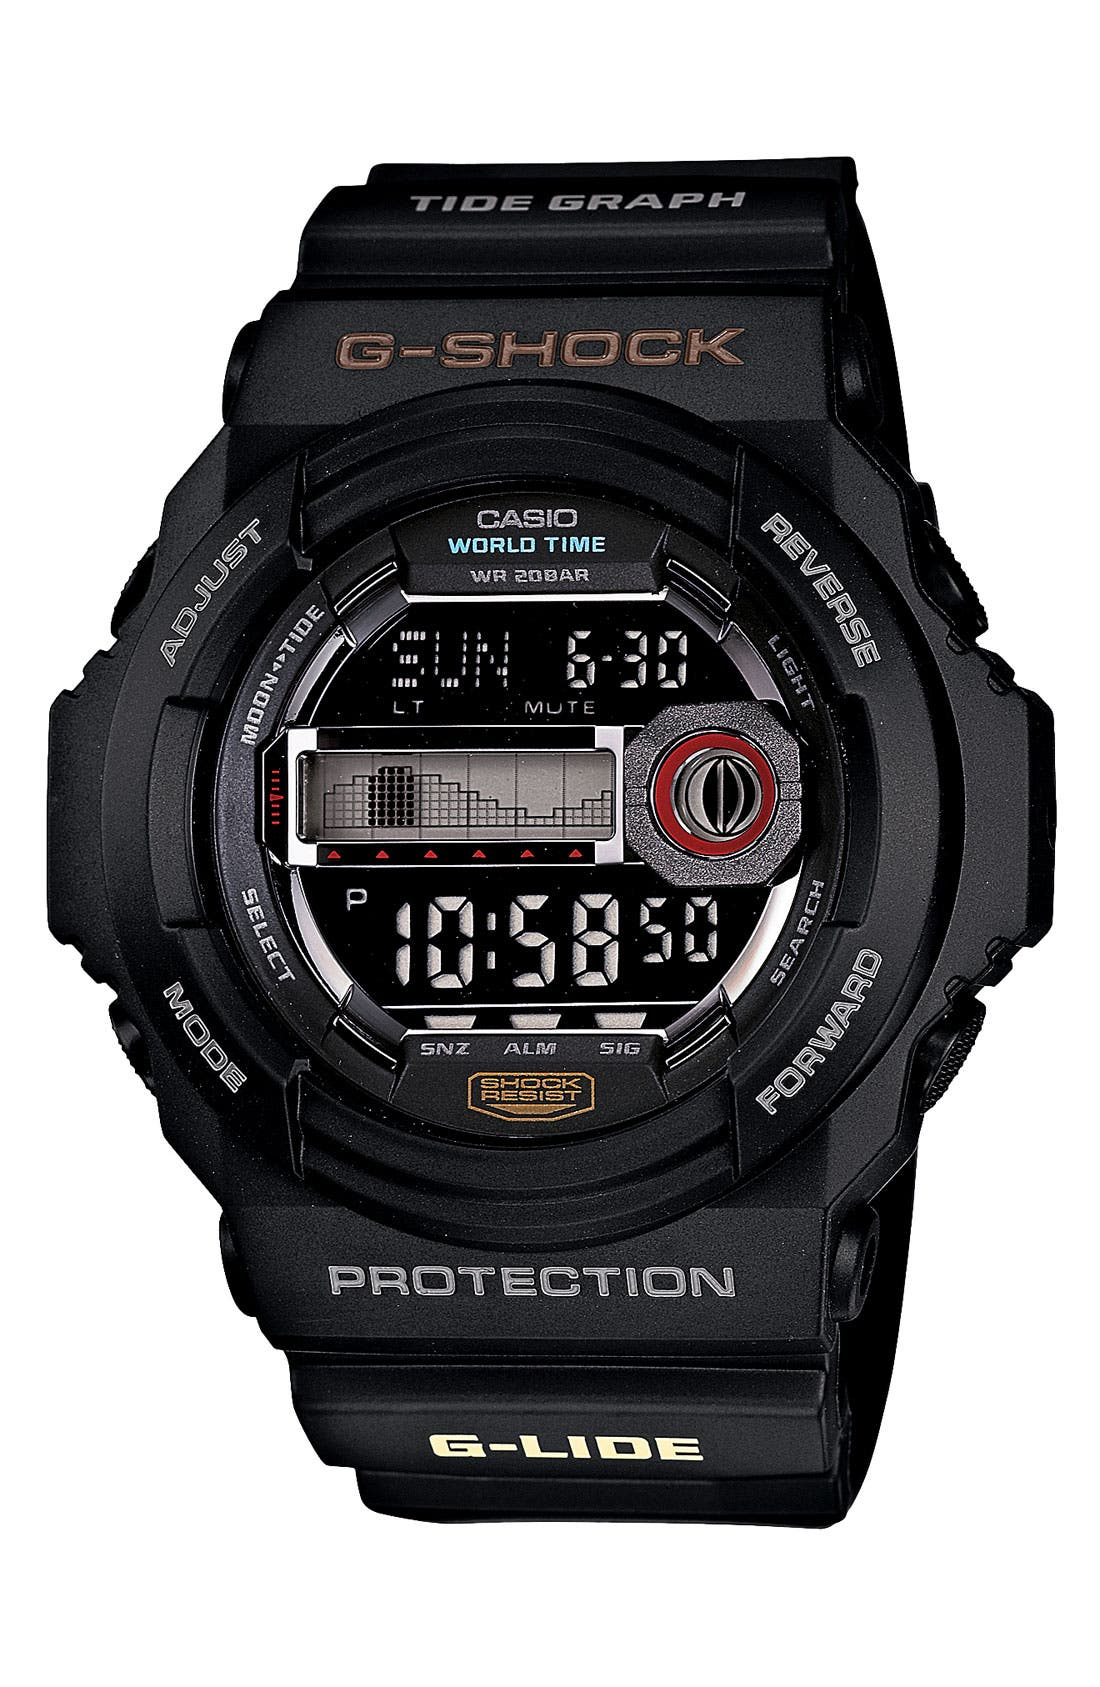 Main Image - G-Shock 'Tidegraph' Digital Watch, 55mm x 52mm